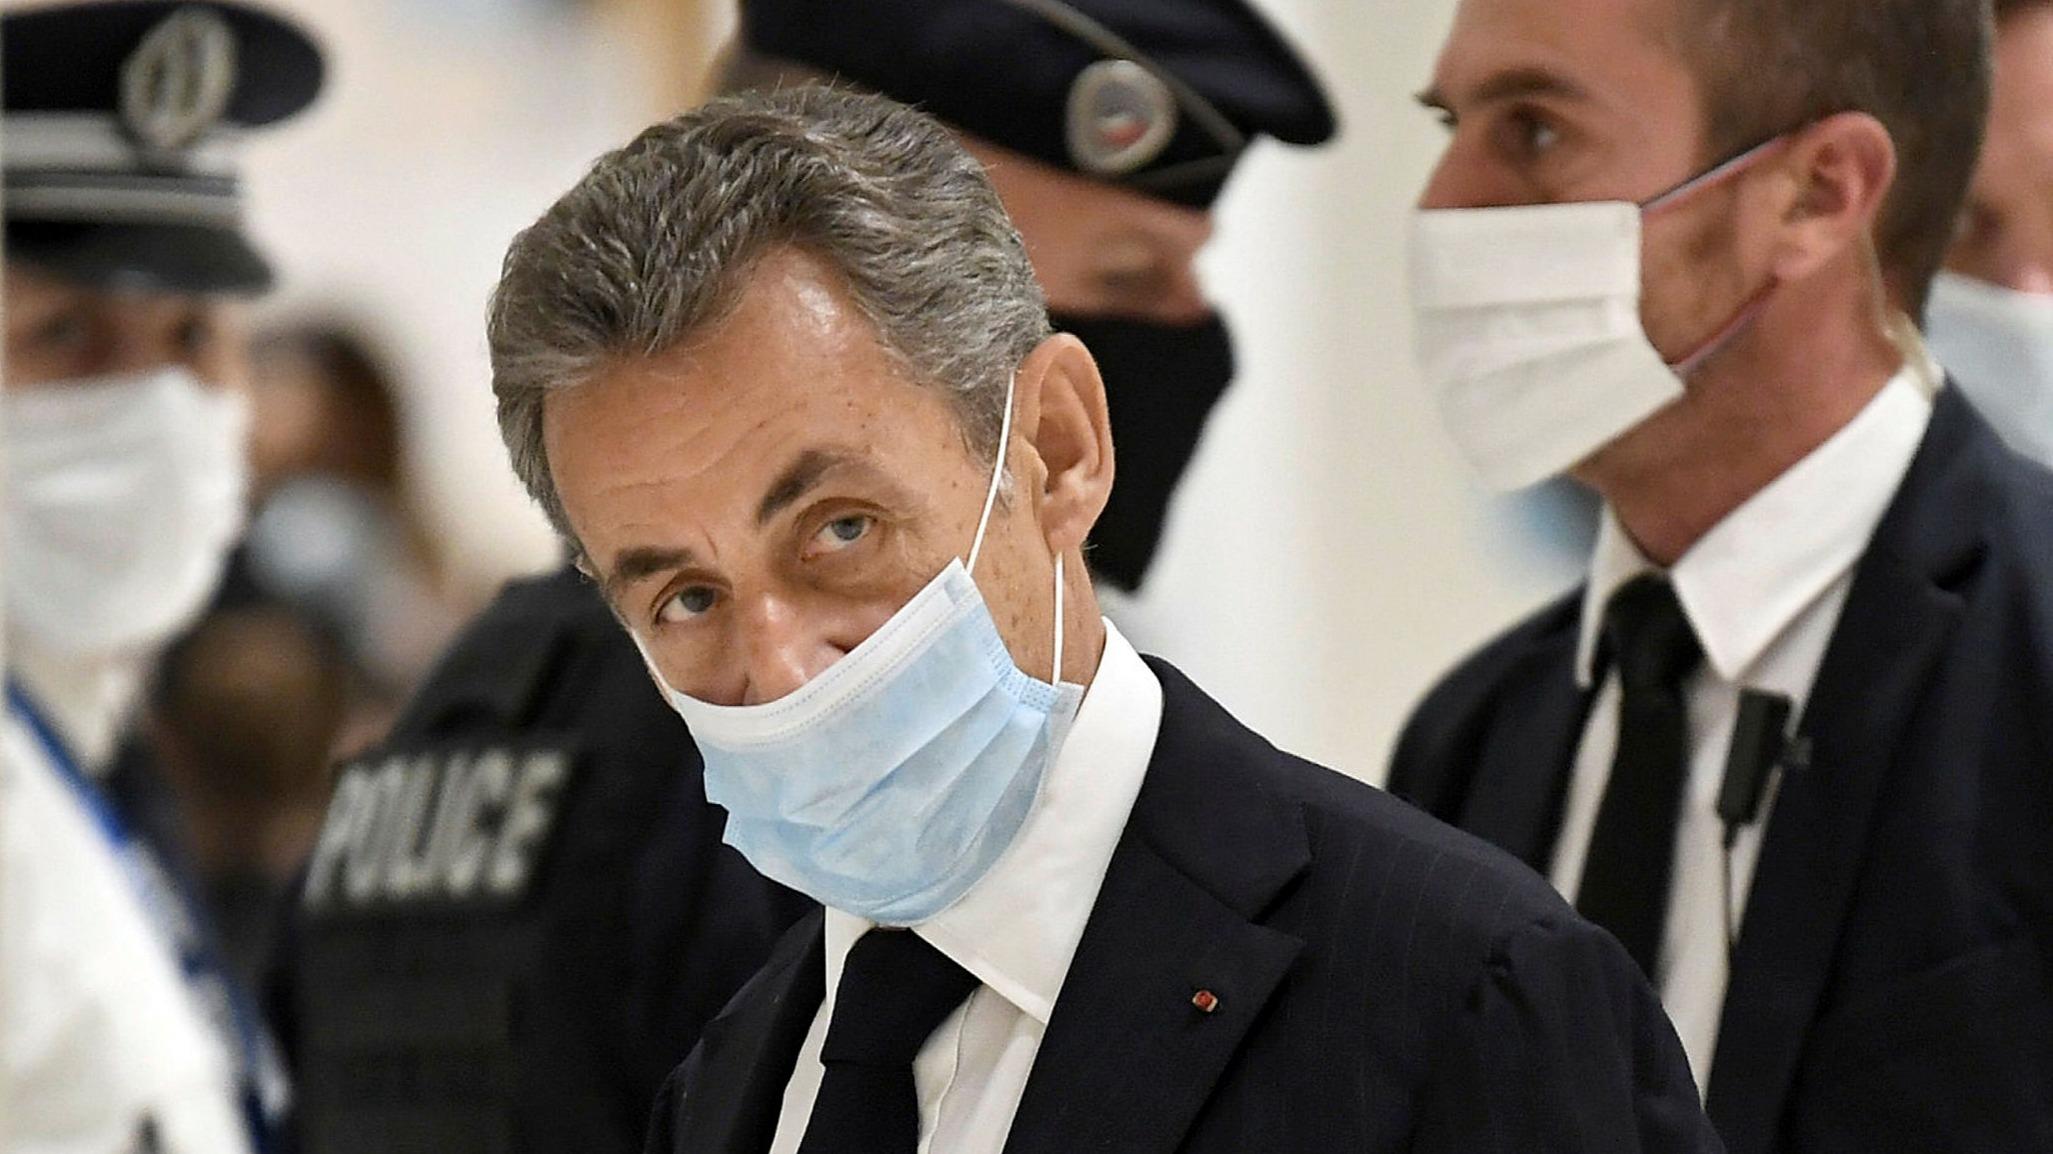 Prosecution pushing for jail time as Sarkozy bribery verdict awaited